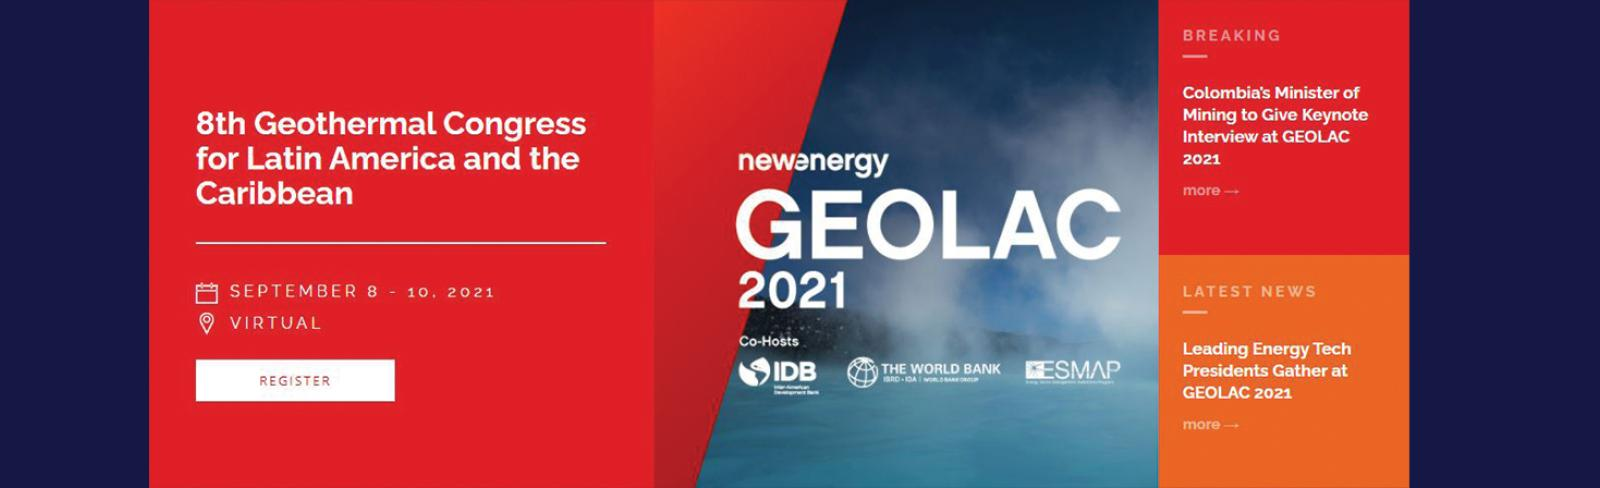 GEOLAC 2021